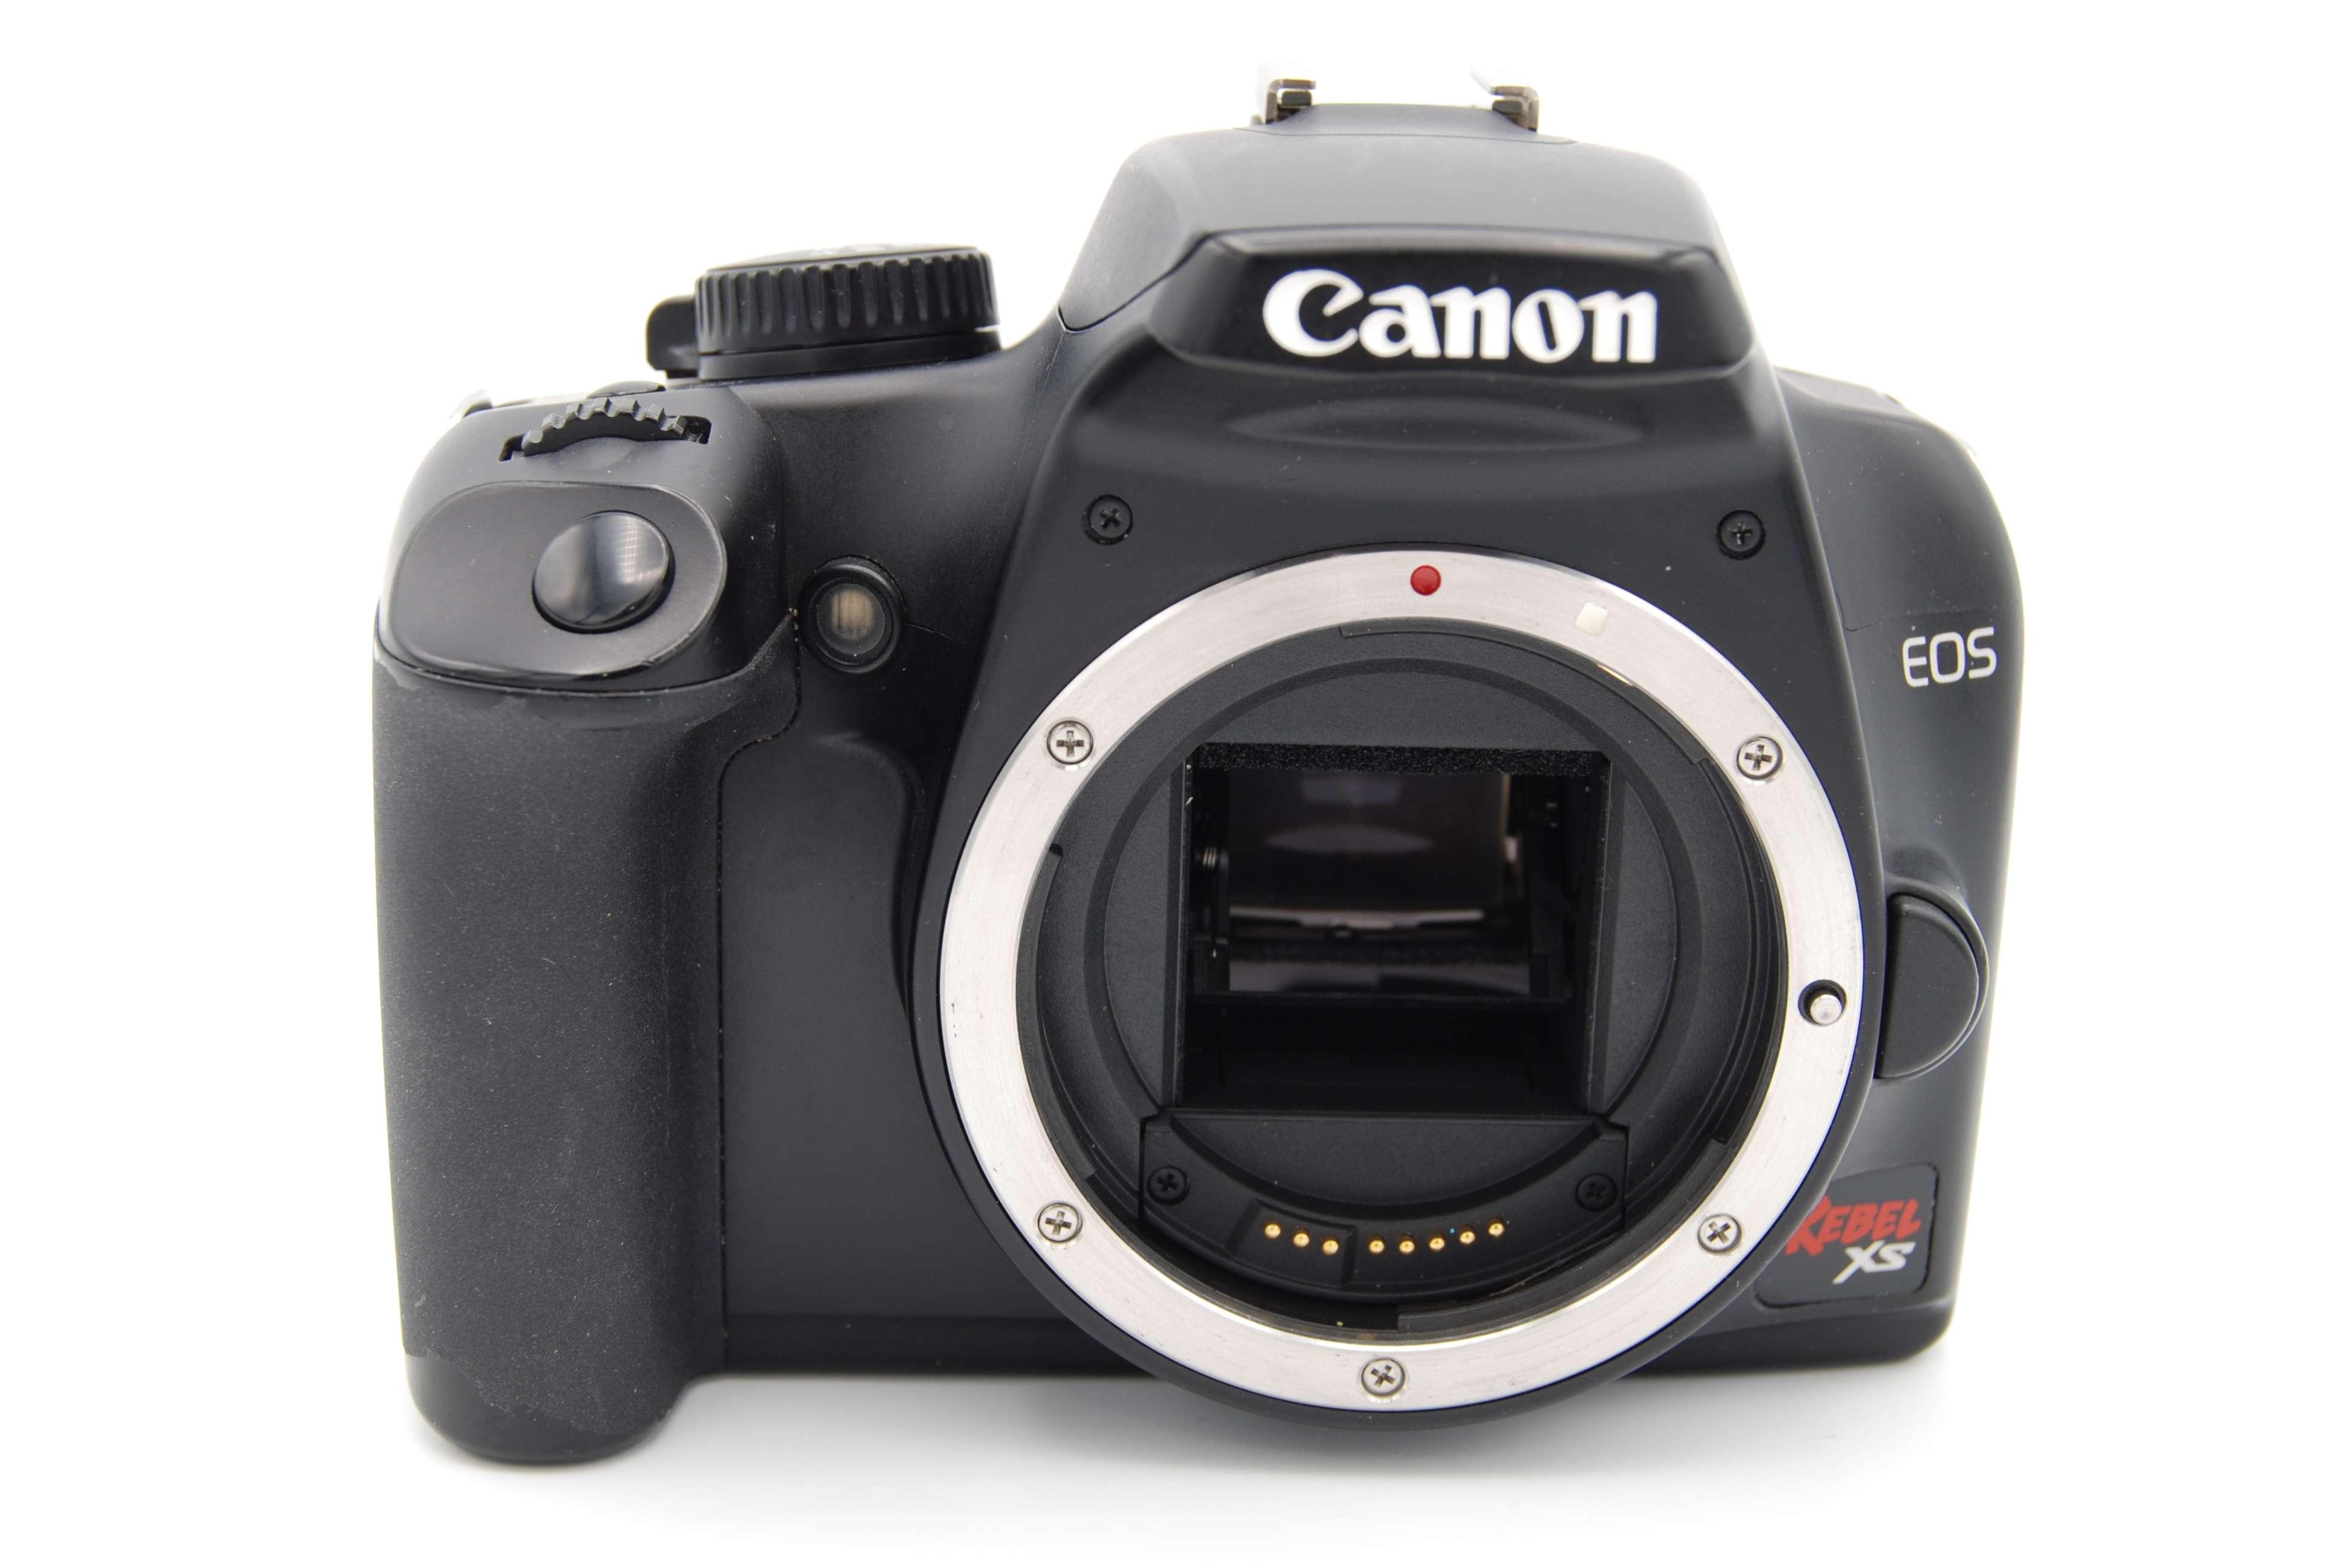 Canon EOS 1000D (EOS Rebel XS / Kiss F Digital) DIGITAL SLR CAMERA BODY ONLY